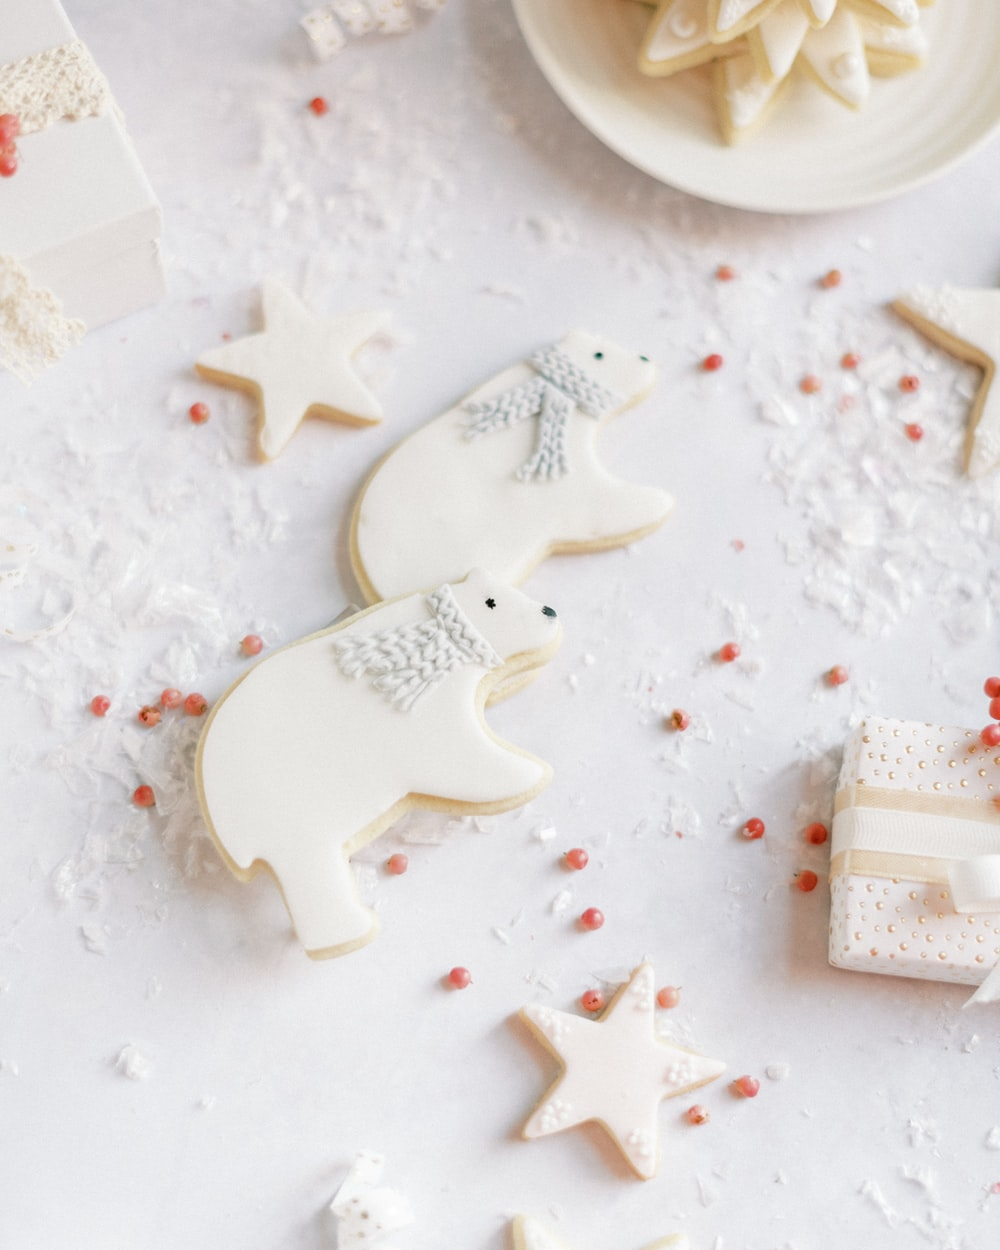 white ceramic heart shaped ornament